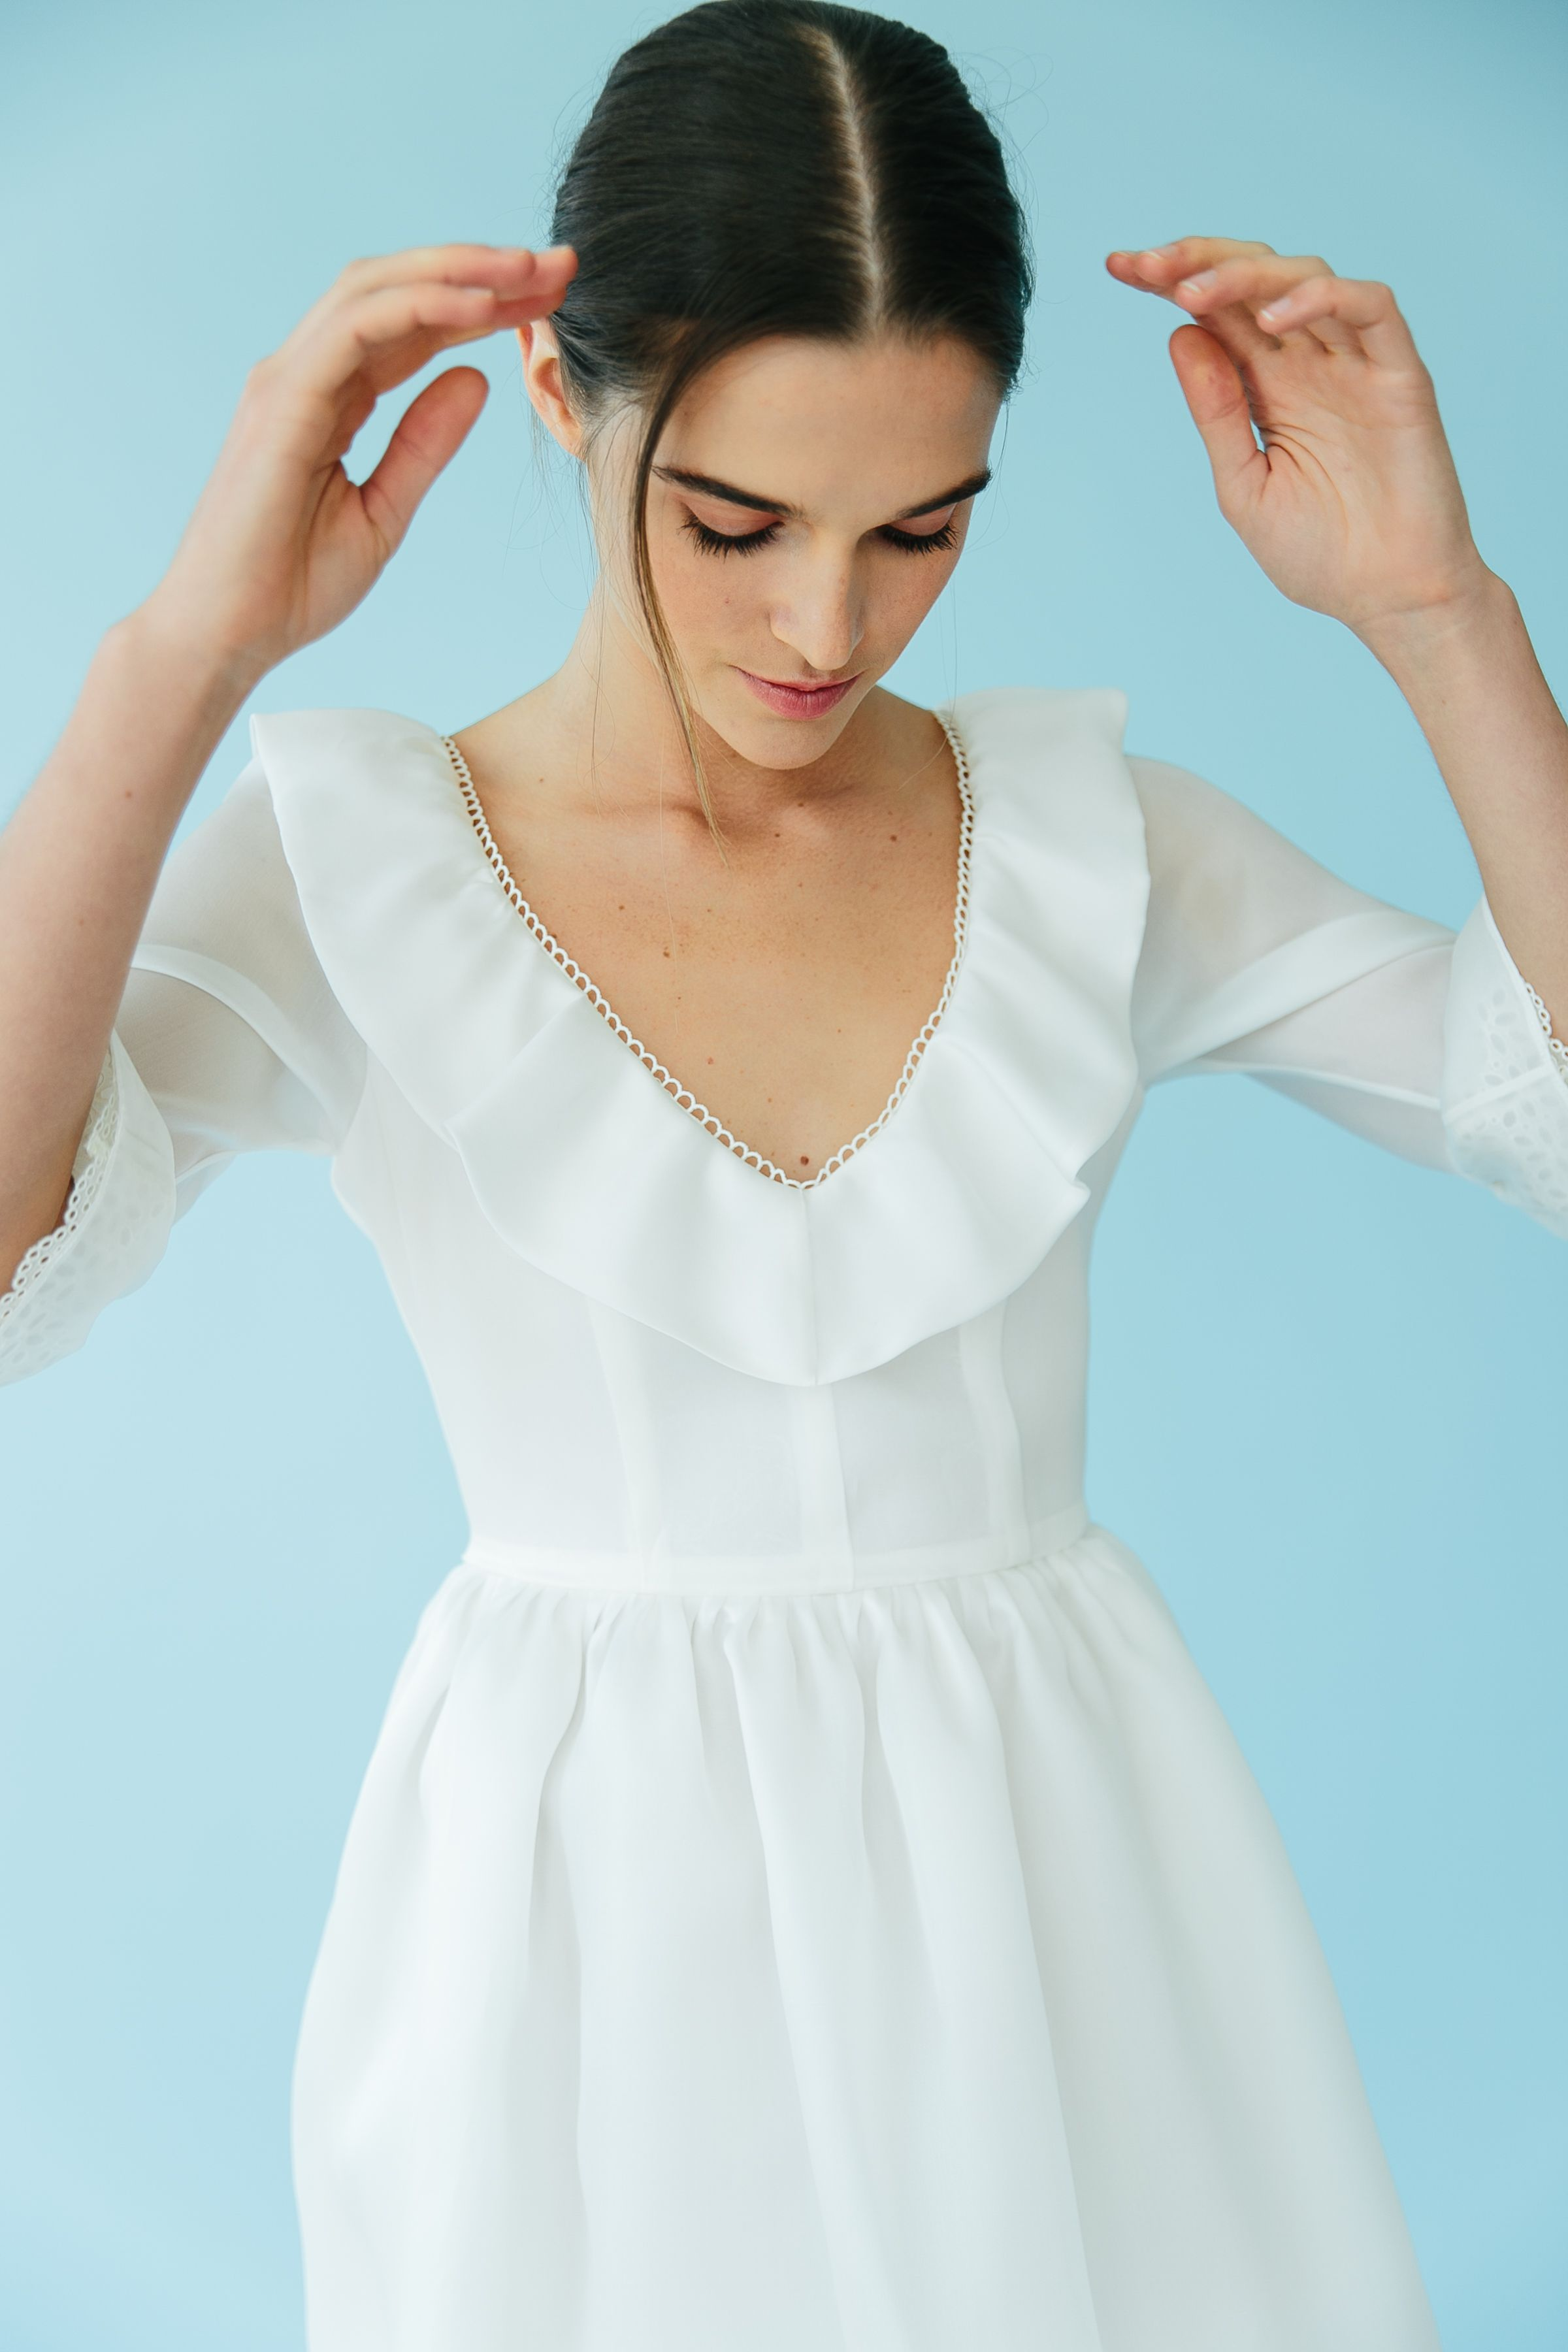 Margaret Dress   Bridal gowns   Pinterest   Sophisticated bride ...